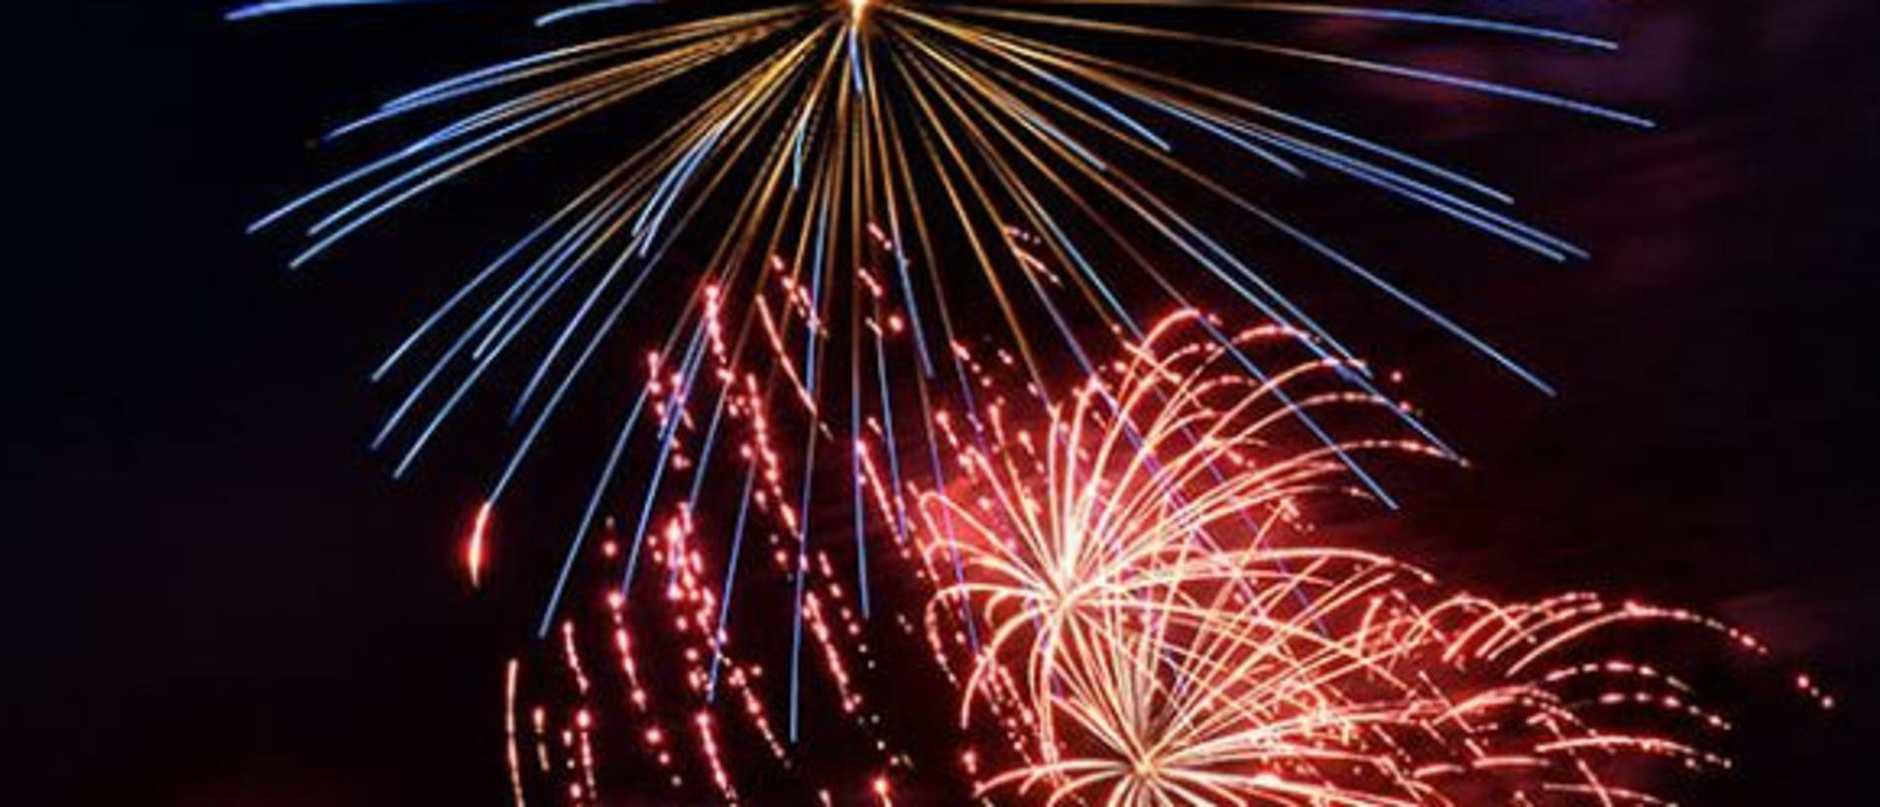 An impromptu fireworks display is under investigation.